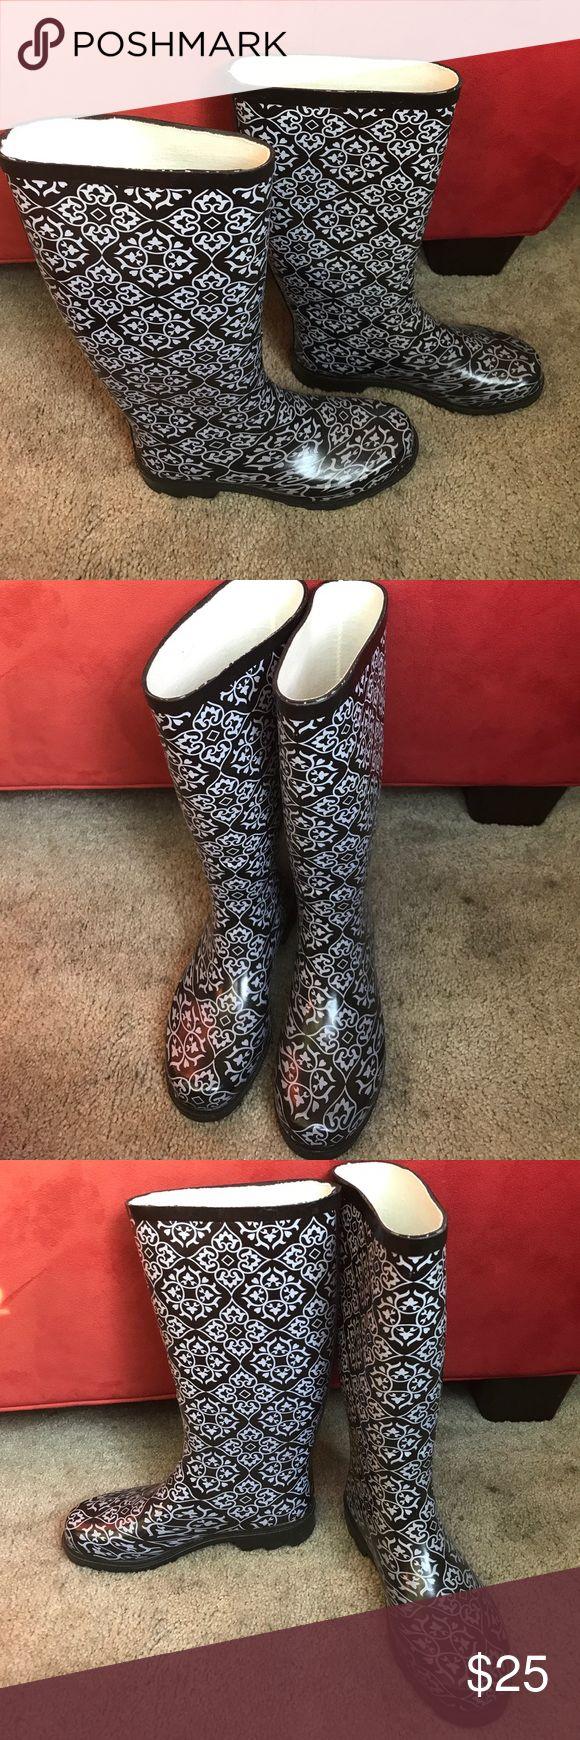 Rasolli size 8 rain boots/wellies/galoshes Cute pair of Rasolli brand rubber rain boots/wellies for sale! Women's size 8, black with grayish paisley pattern, worn only twice. Very sturdy waterproof galoshes. Rasolli Shoes Winter & Rain Boots